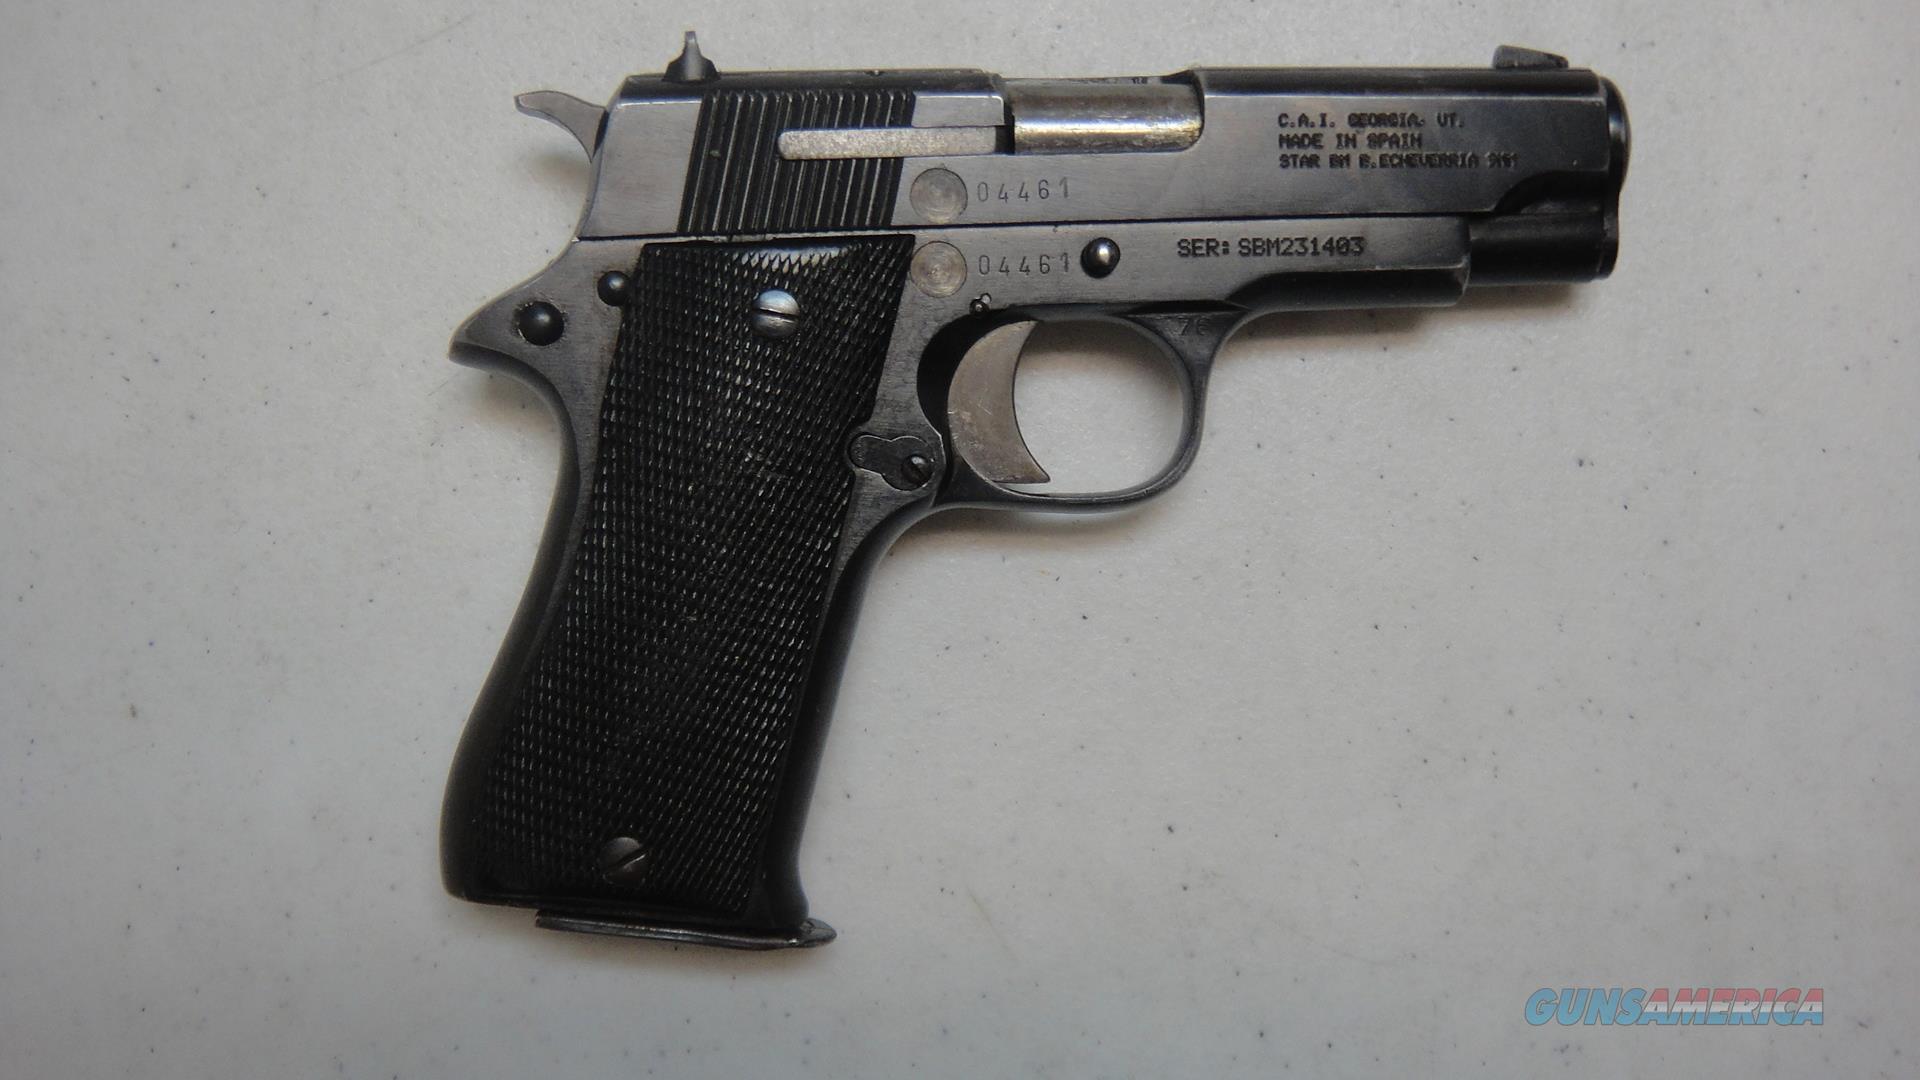 Star/CAI BM 9  Guns > Pistols > Star Pistols